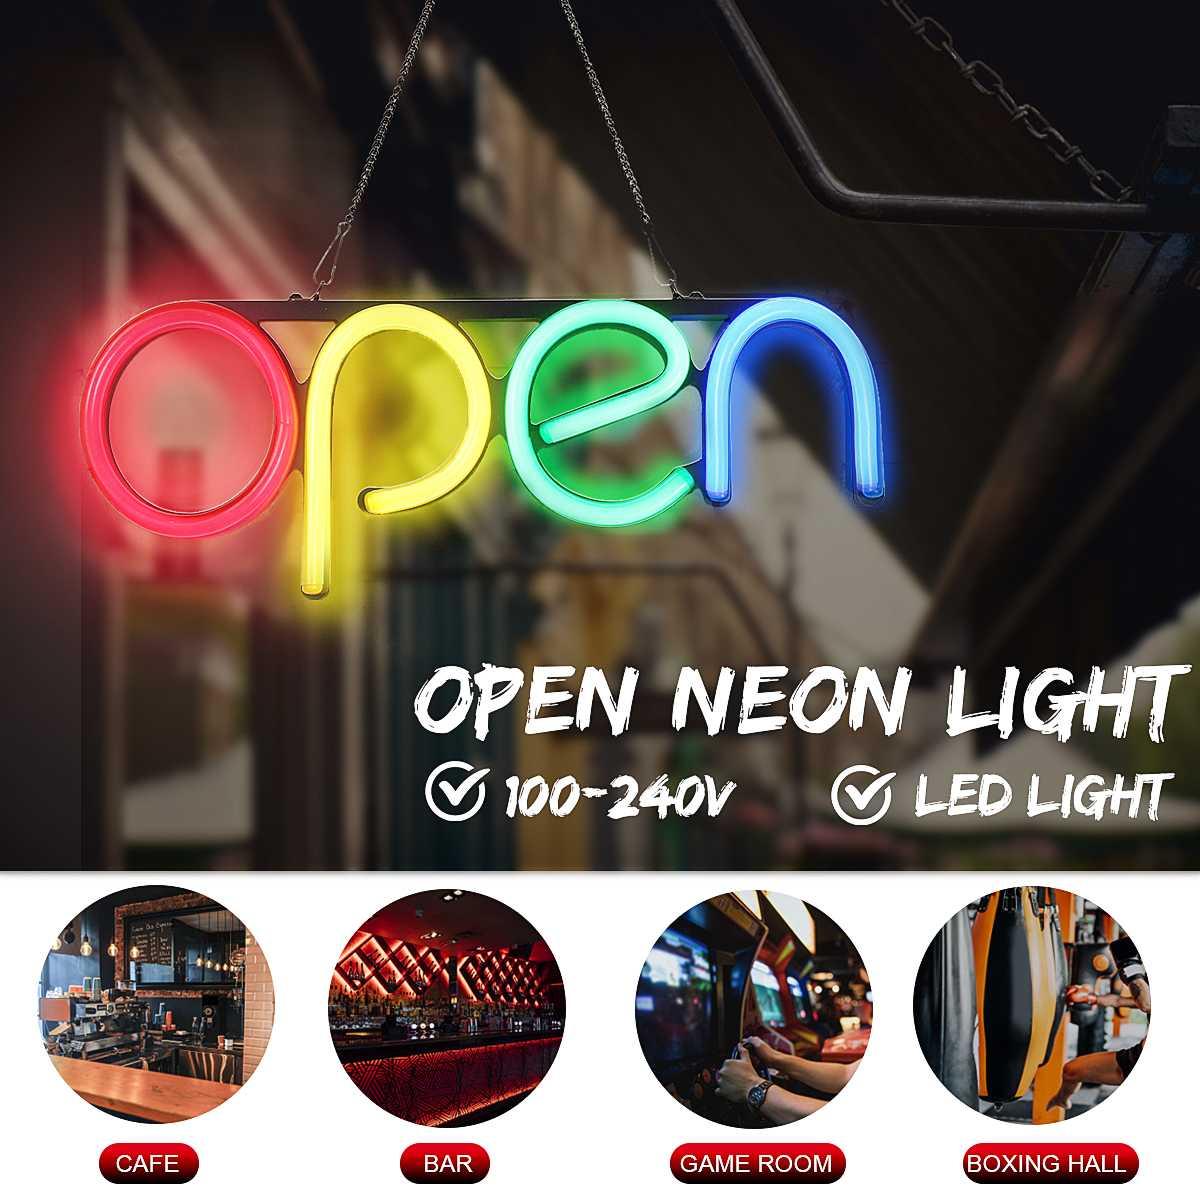 Tubo de neón-bombillas Led-luz colgante de pared letrero abierto de neón tubo LED hecho a mano obra de arte Visual Bar Pub Club decoración de pared Luz